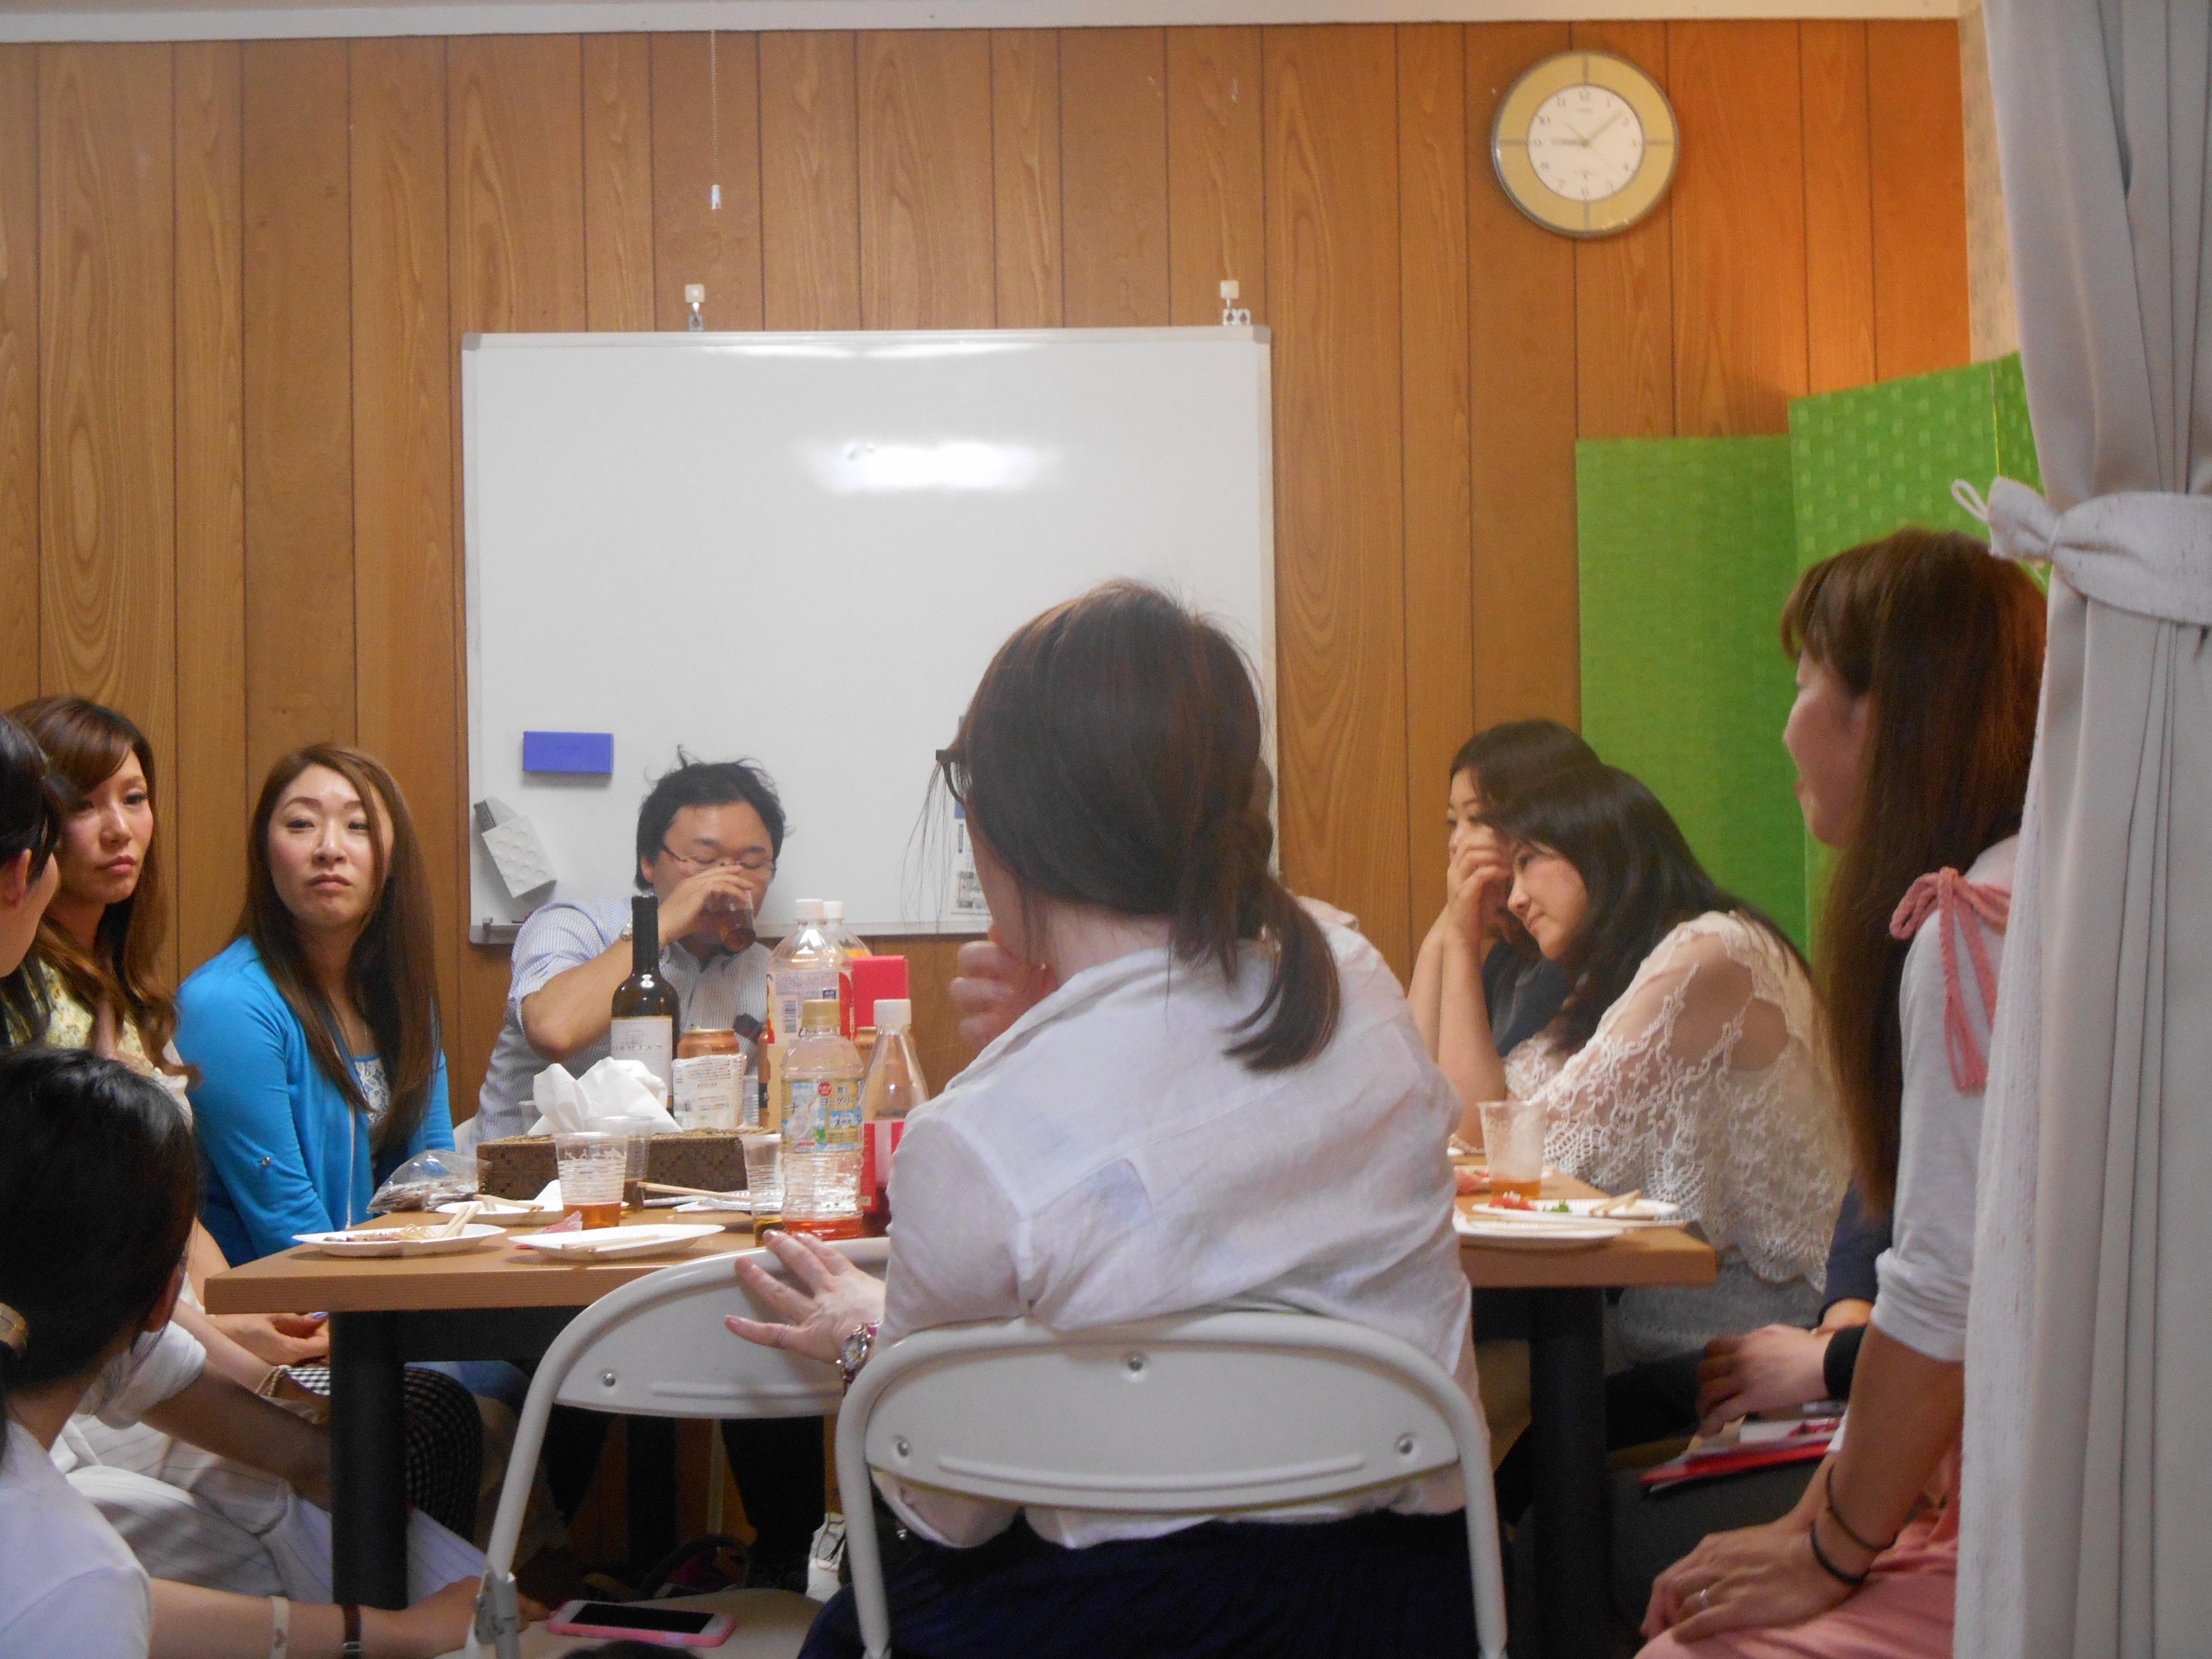 DSCN1651 - 2019年7月16日愛の子育て塾第15期第2講座開催しました。